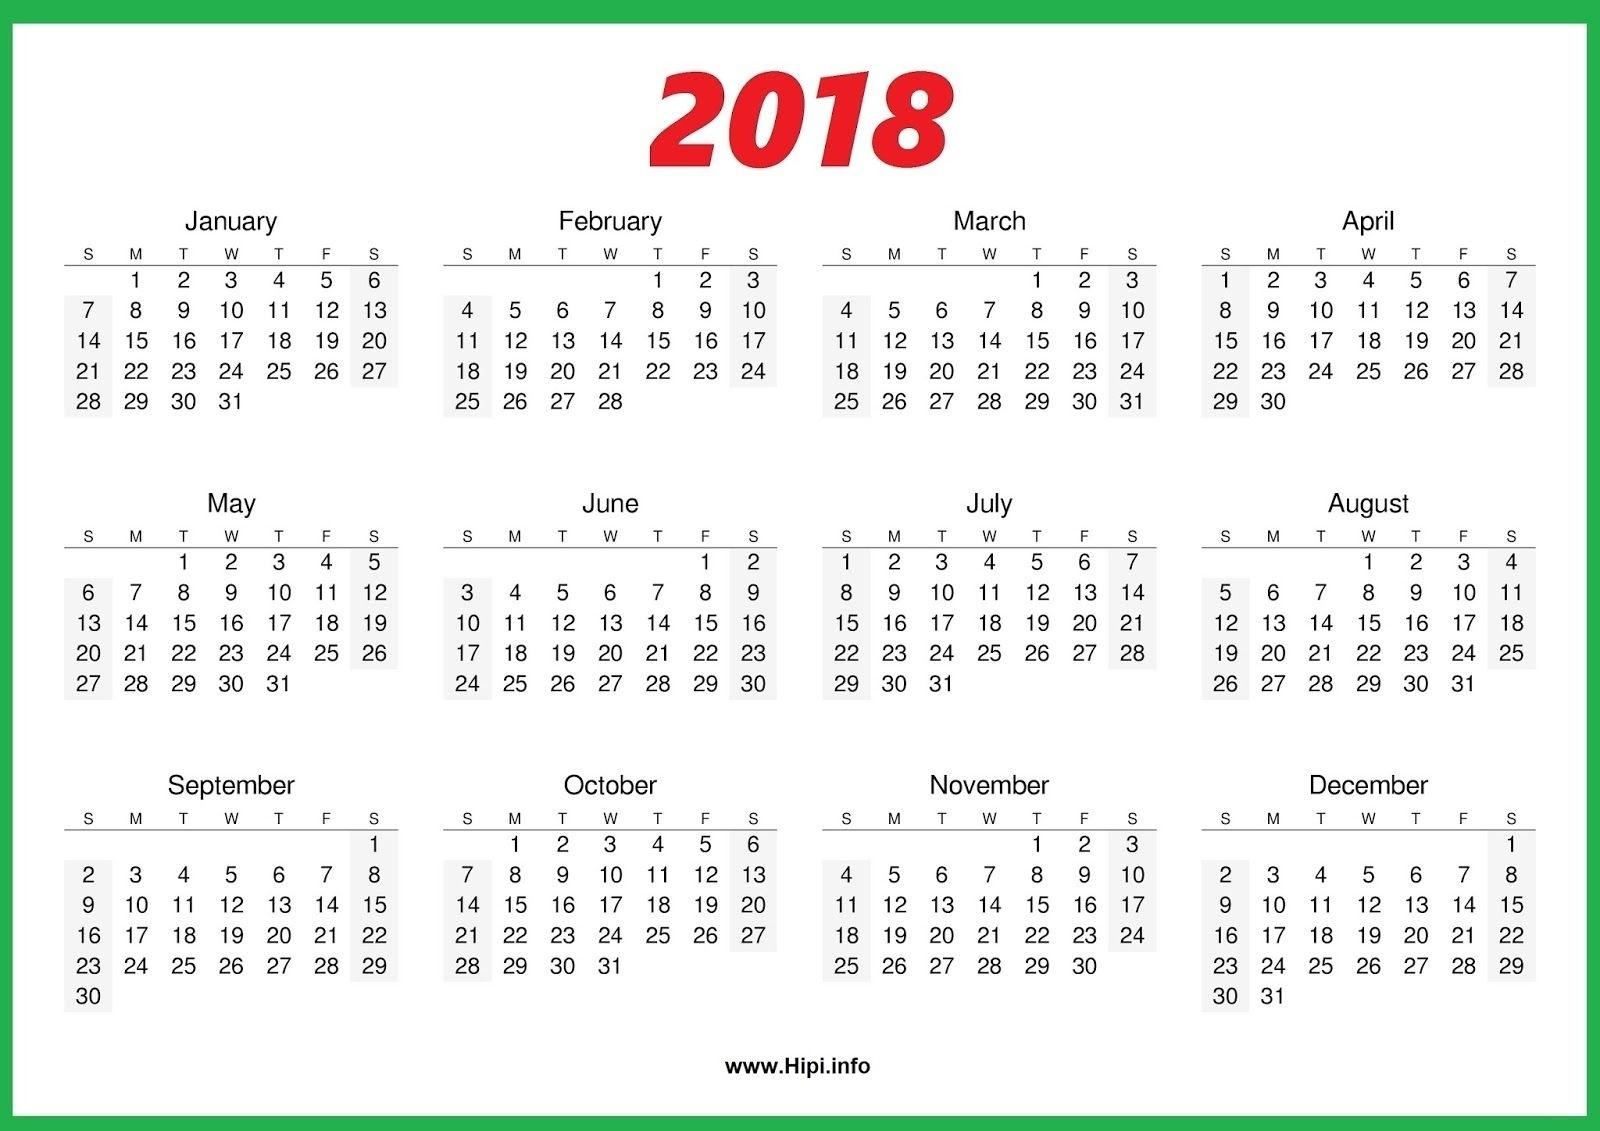 Calendar Printing One Page • Printable Blank Calendar Template_Calendar Printing One Page